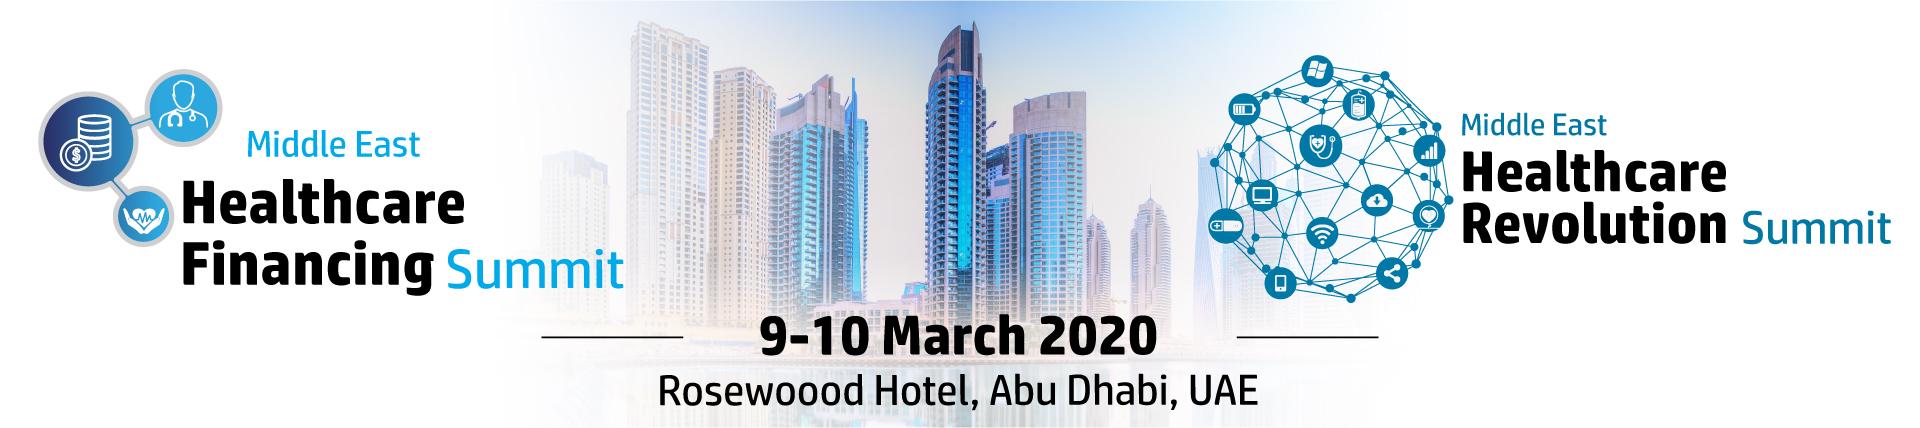 Middle East Healthcare Financing Summit, Abu Dhabi, United Arab Emirates